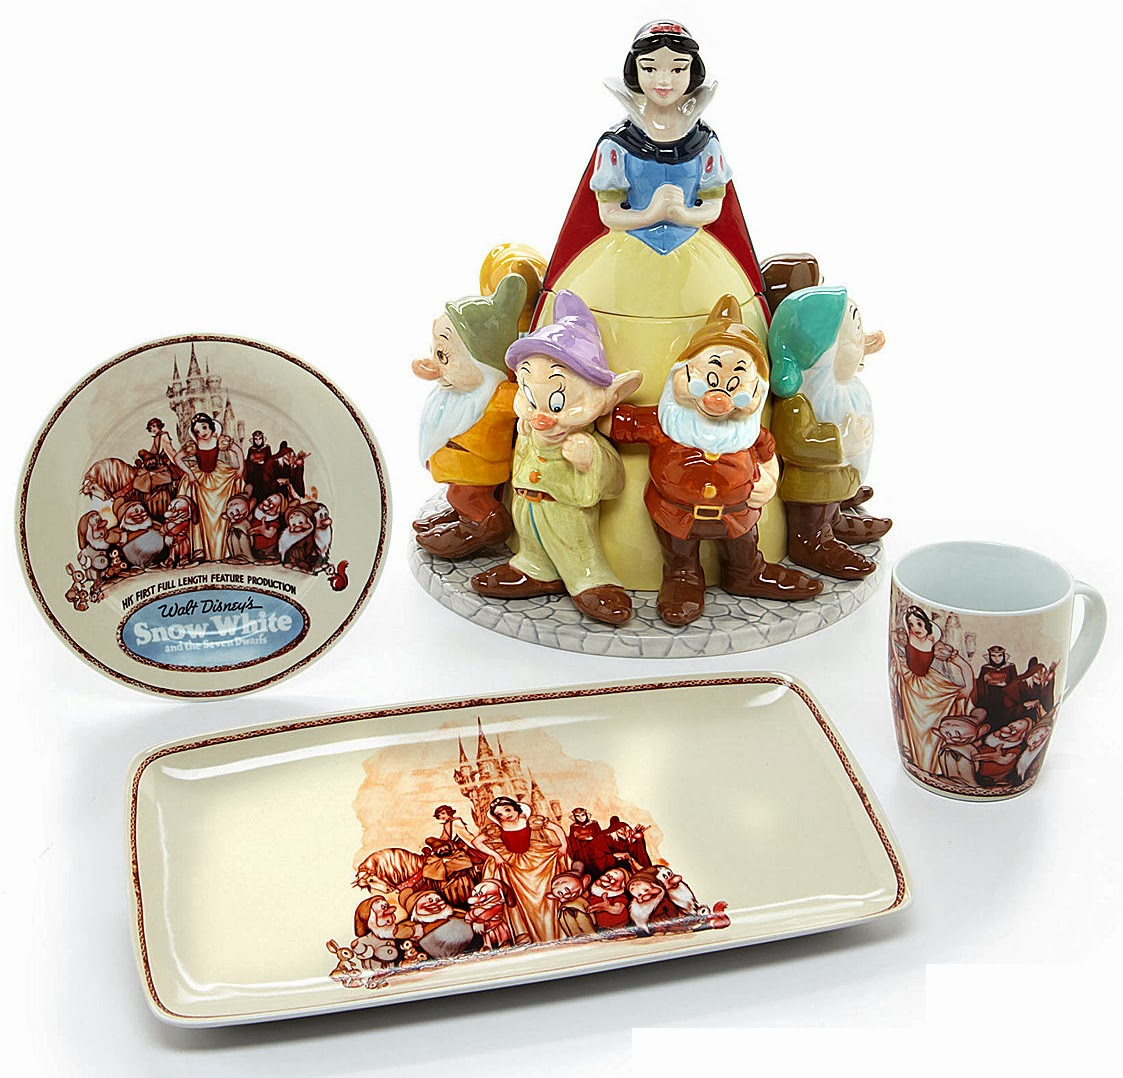 Dillardu0027s Snow White 75th Anniversary Dinnerware  sc 1 st  Filmic Light & Filmic Light - Snow White Archive: Dillardu0027s Snow White 75th ...